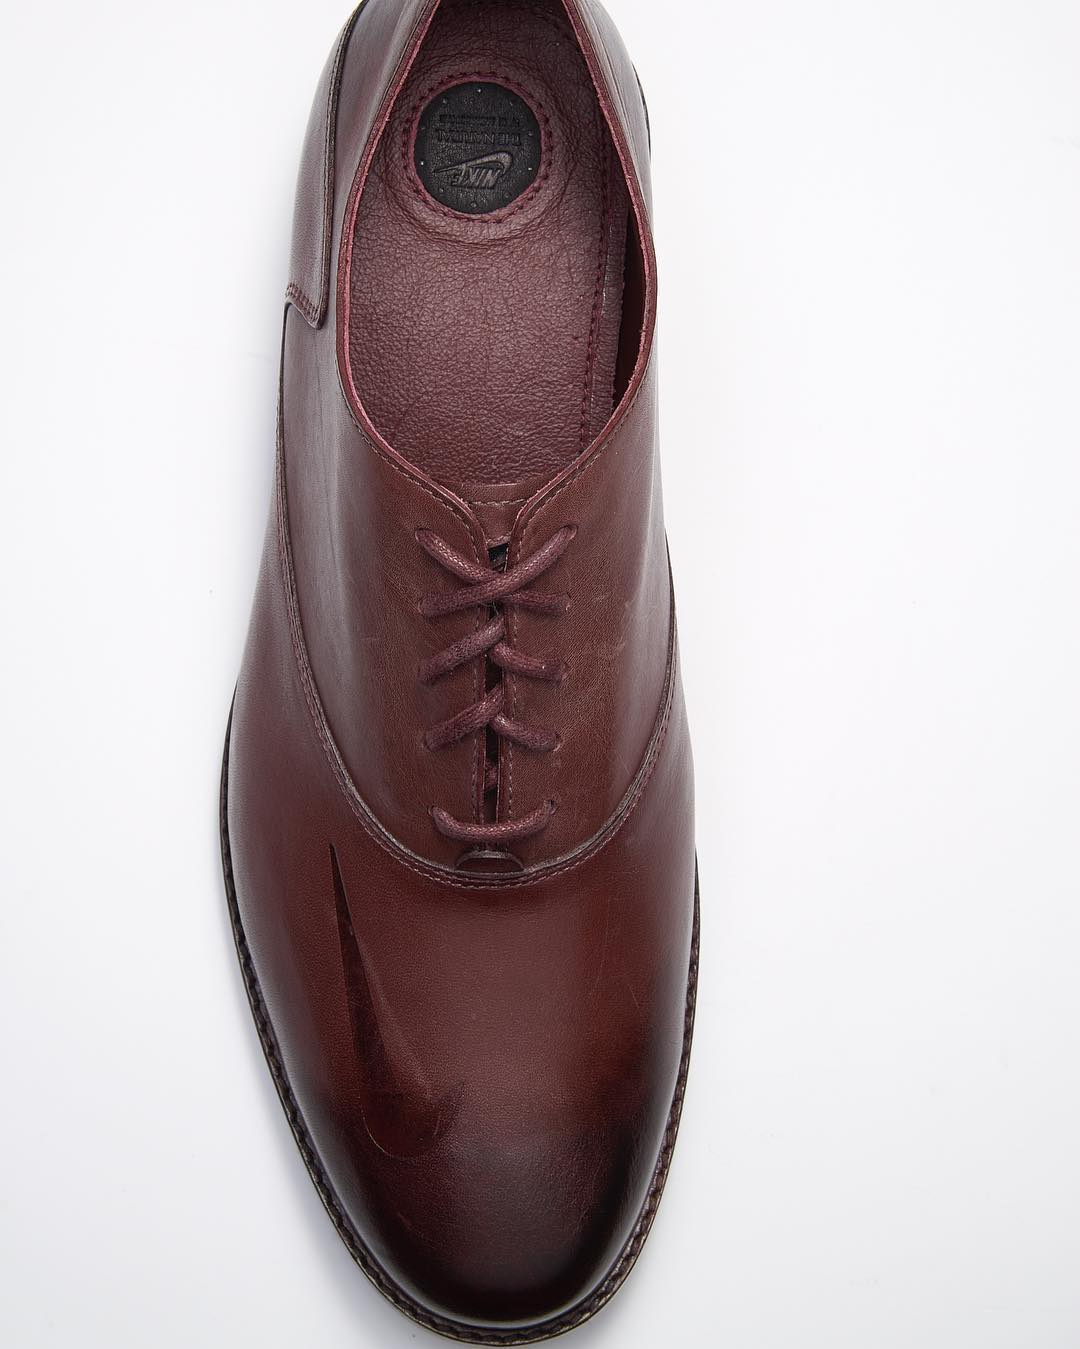 ken-griffey-nike-hall-of-fame-dress-shoes-1_sopupn